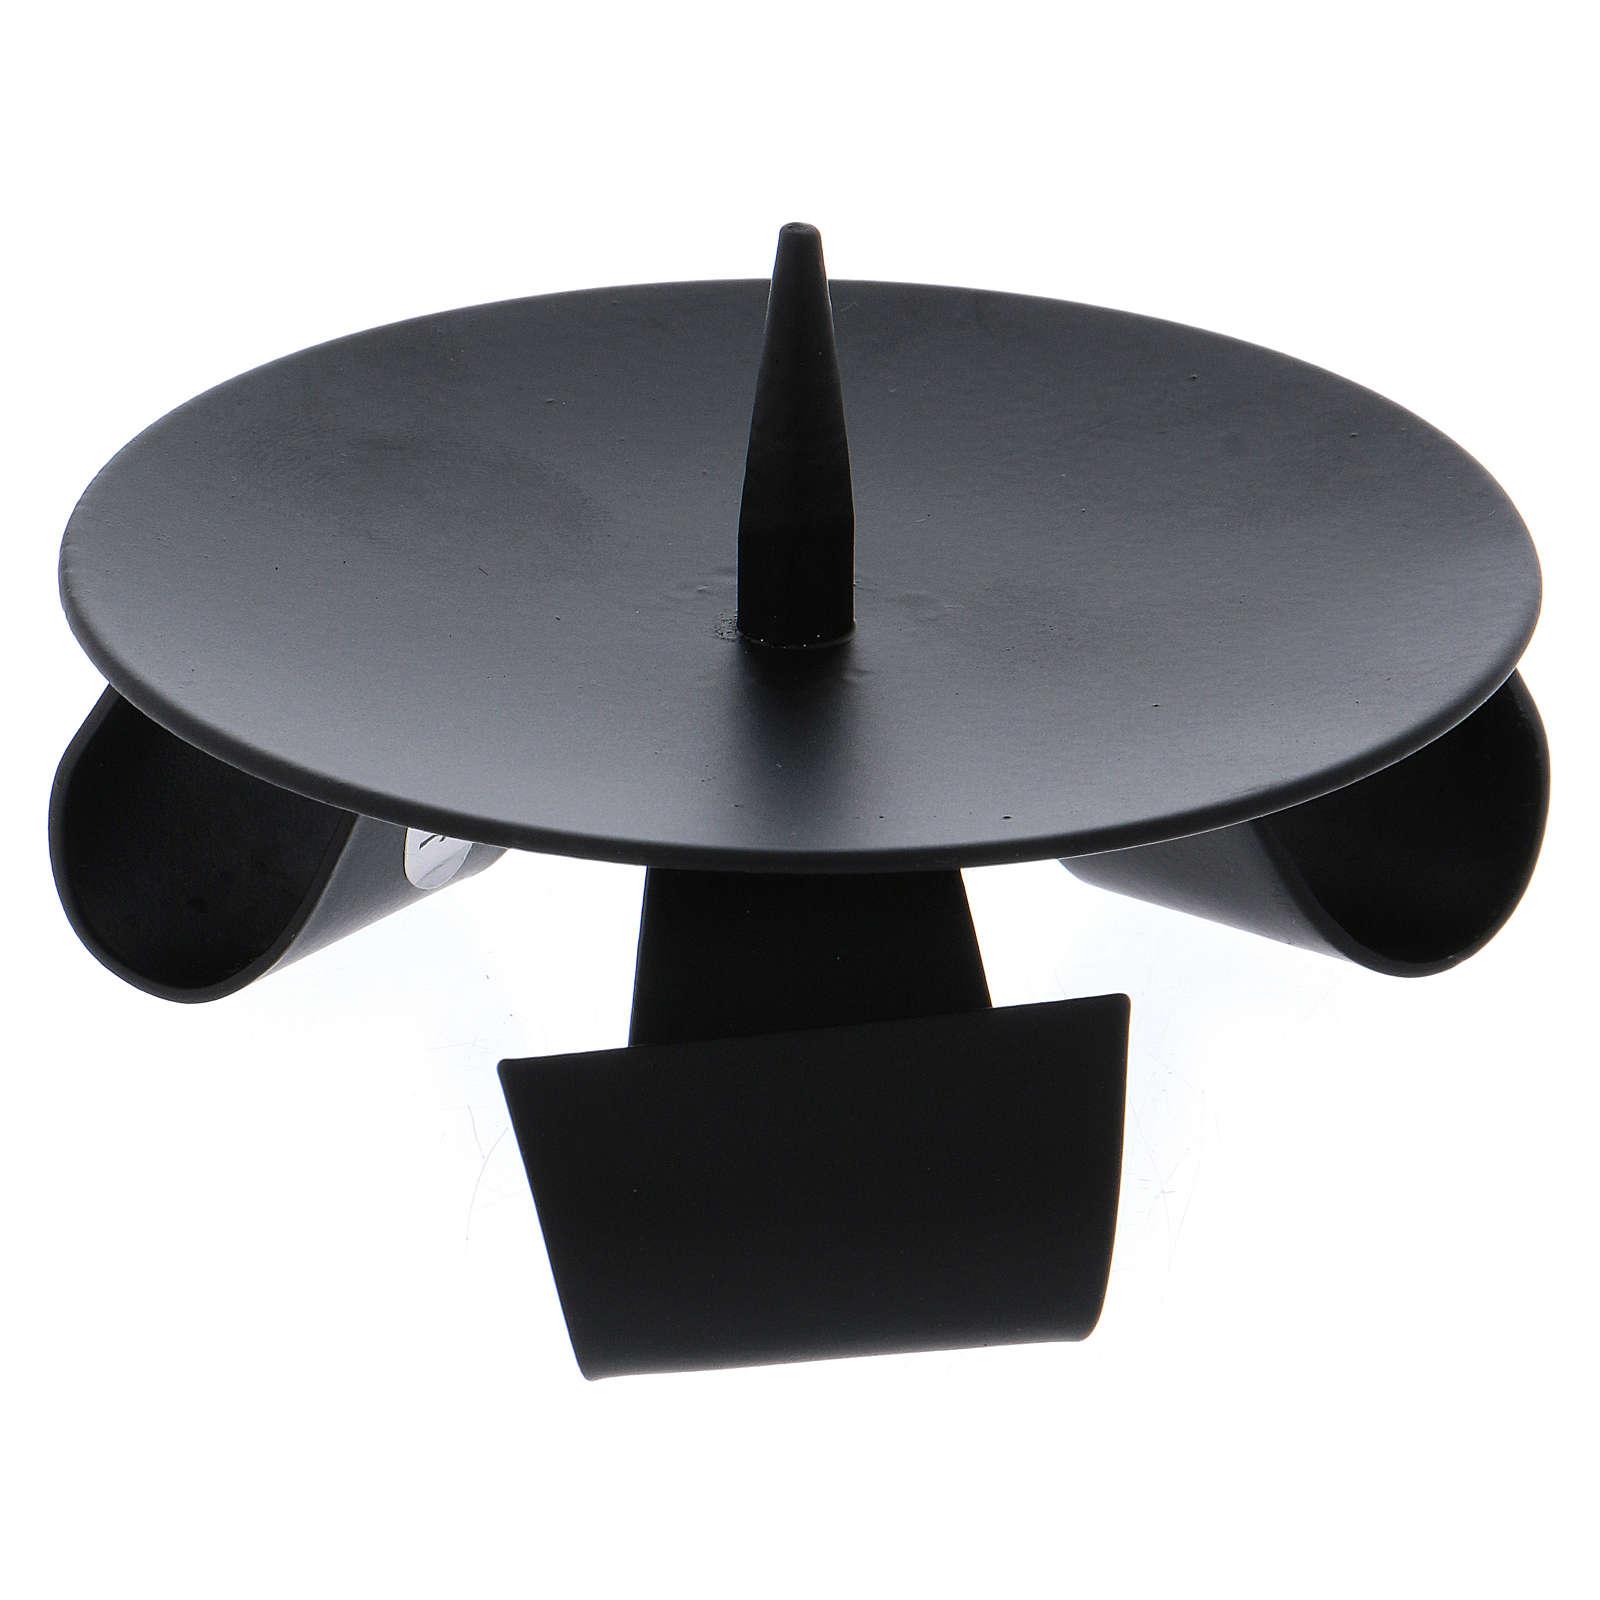 Bougeoir 3 pieds style moderne avec pique fer noir 3